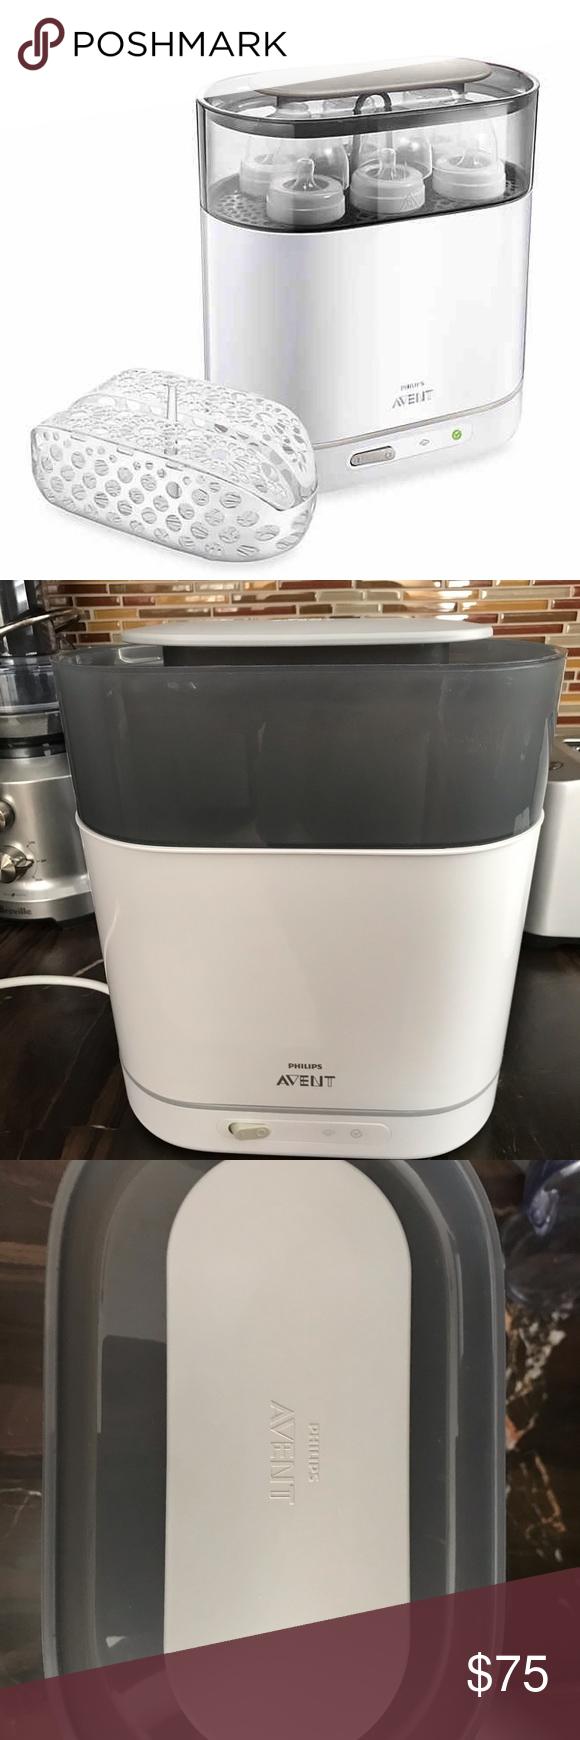 Philips Avent 4 In 1 Steam Sterilizer Dishwasher Basket Philips Avent Philips